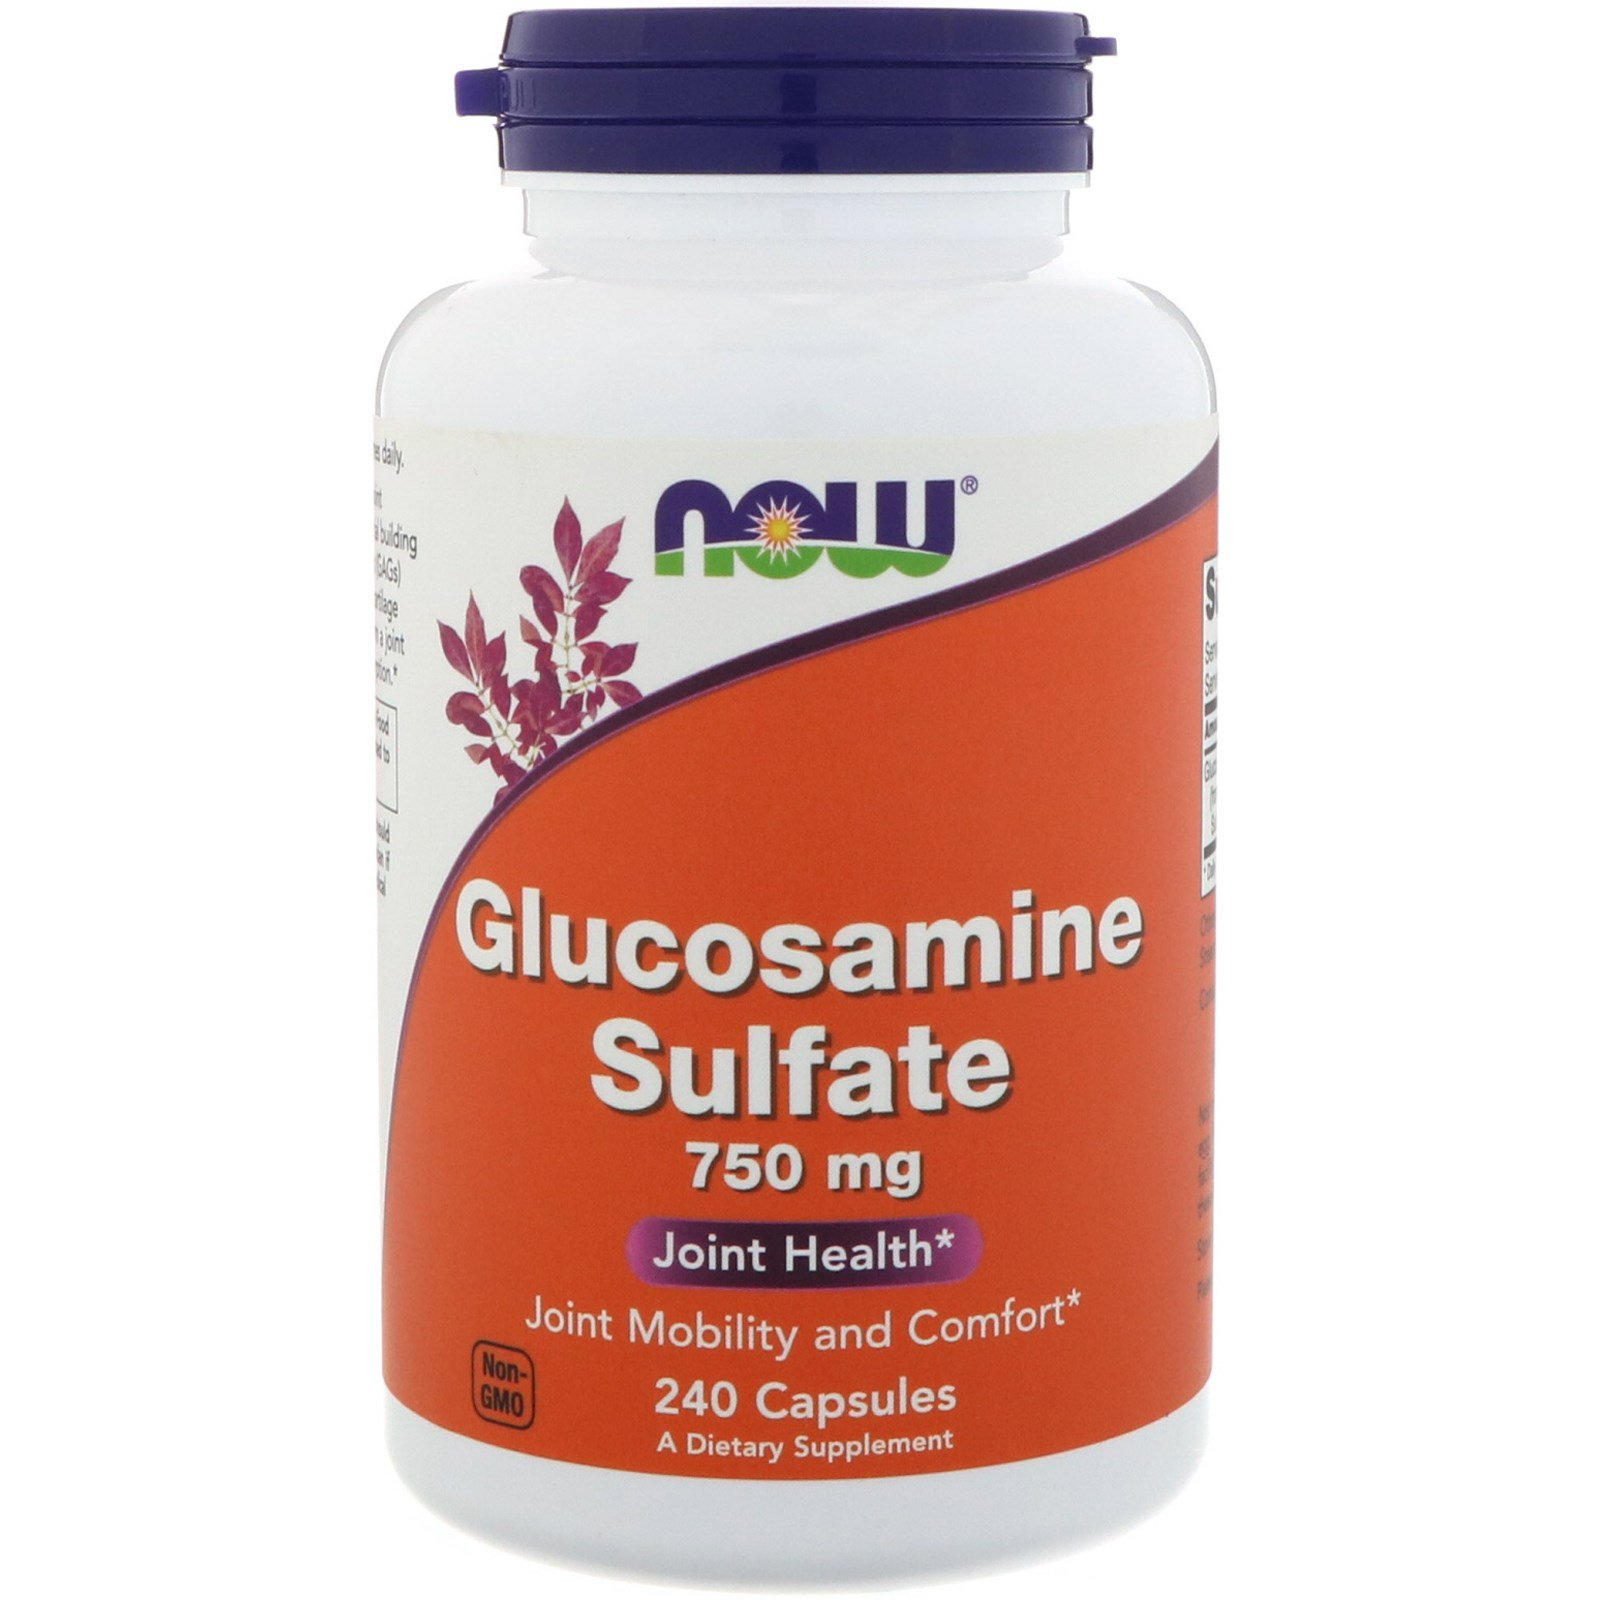 Glucosamine sulfate brands